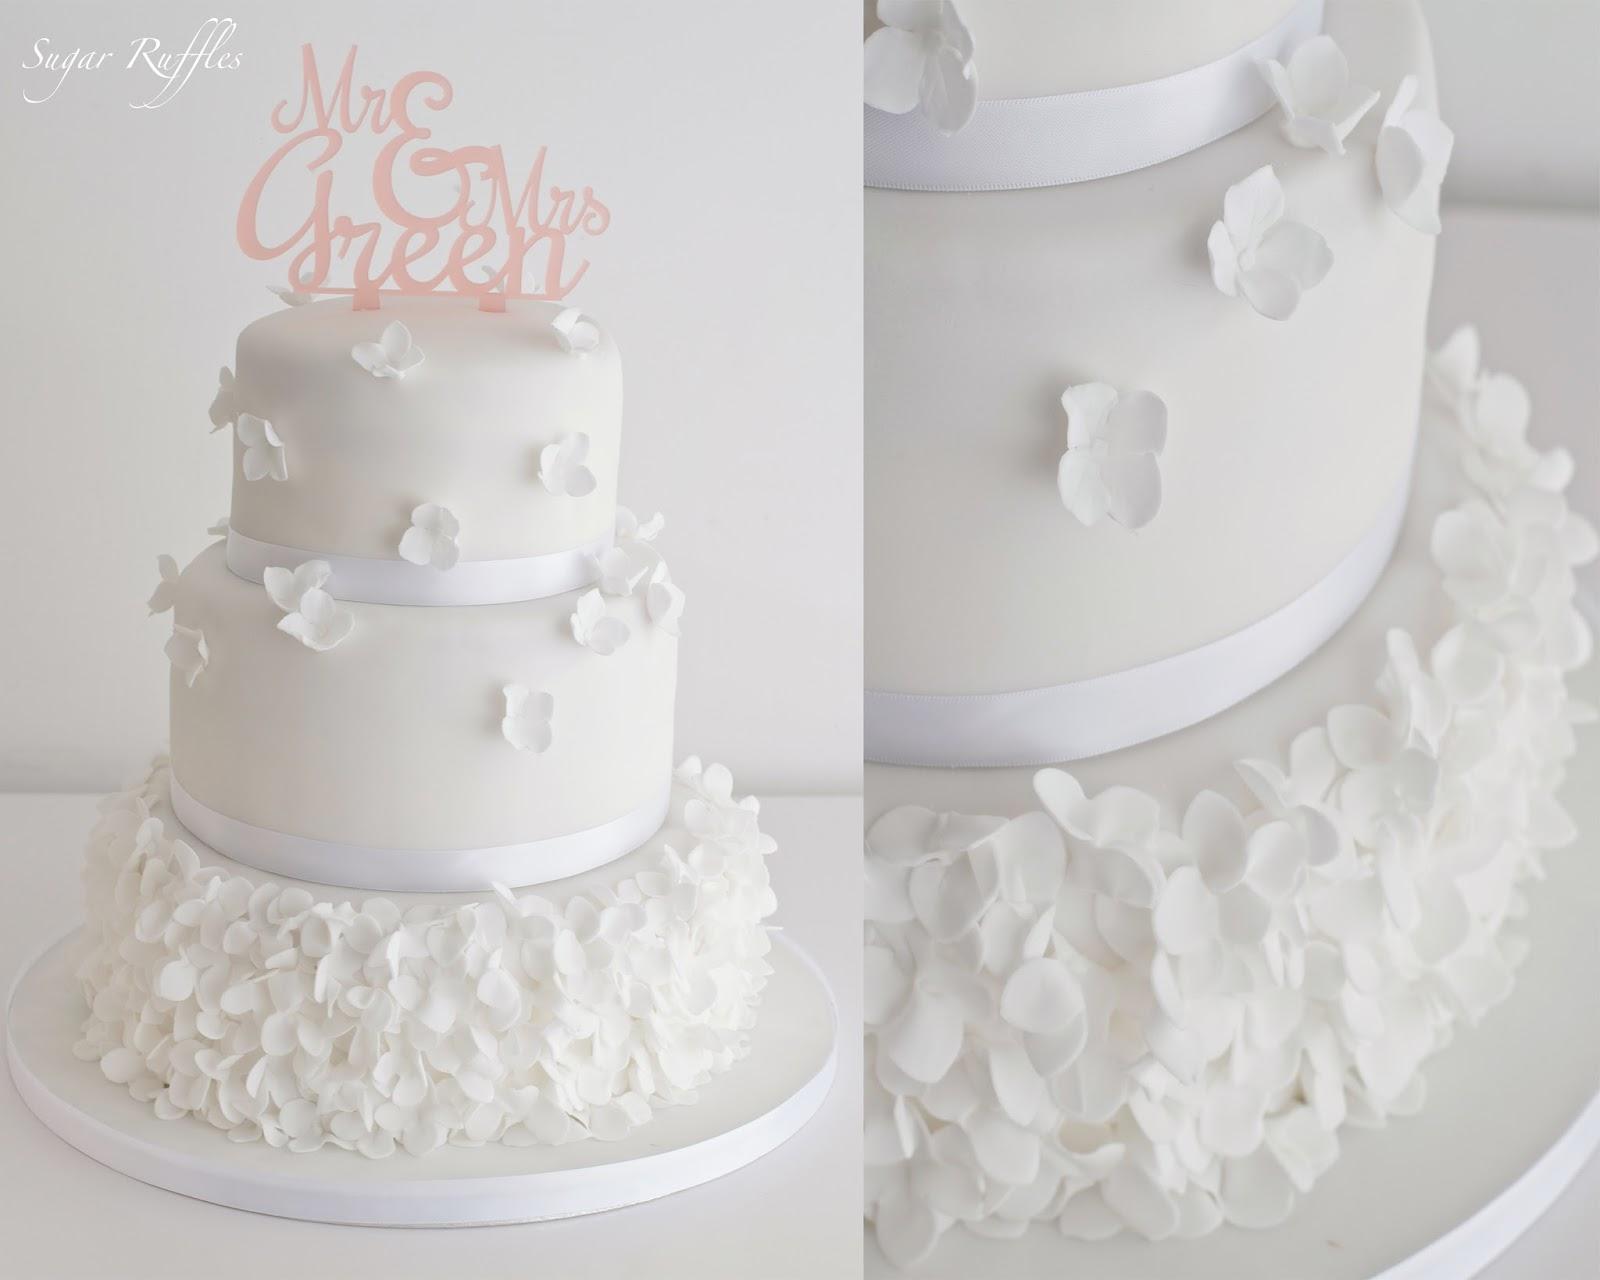 3 Tier Wedding Cakes 65 Fabulous A tier wedding cake